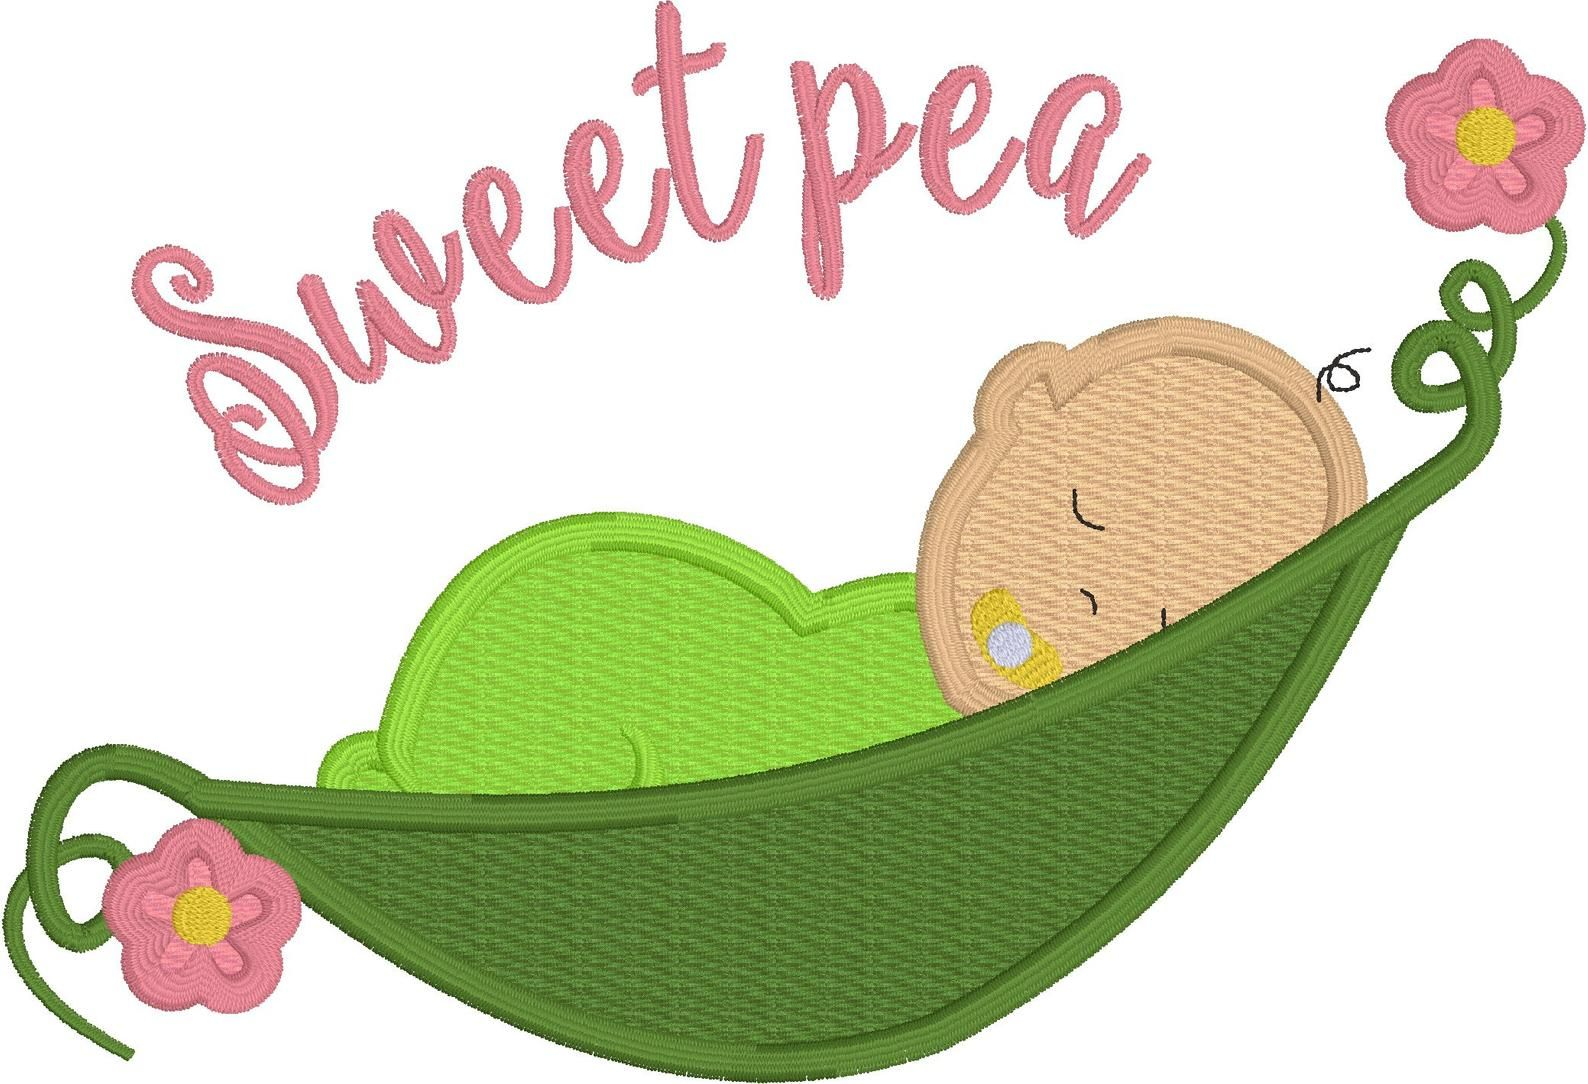 sweet pea stickdateien # 6